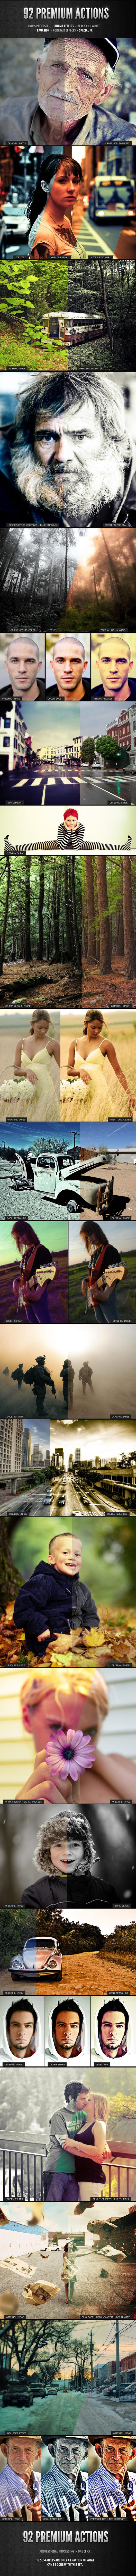 92 Premium Photoshop Actions Set - Photo Effects Actions